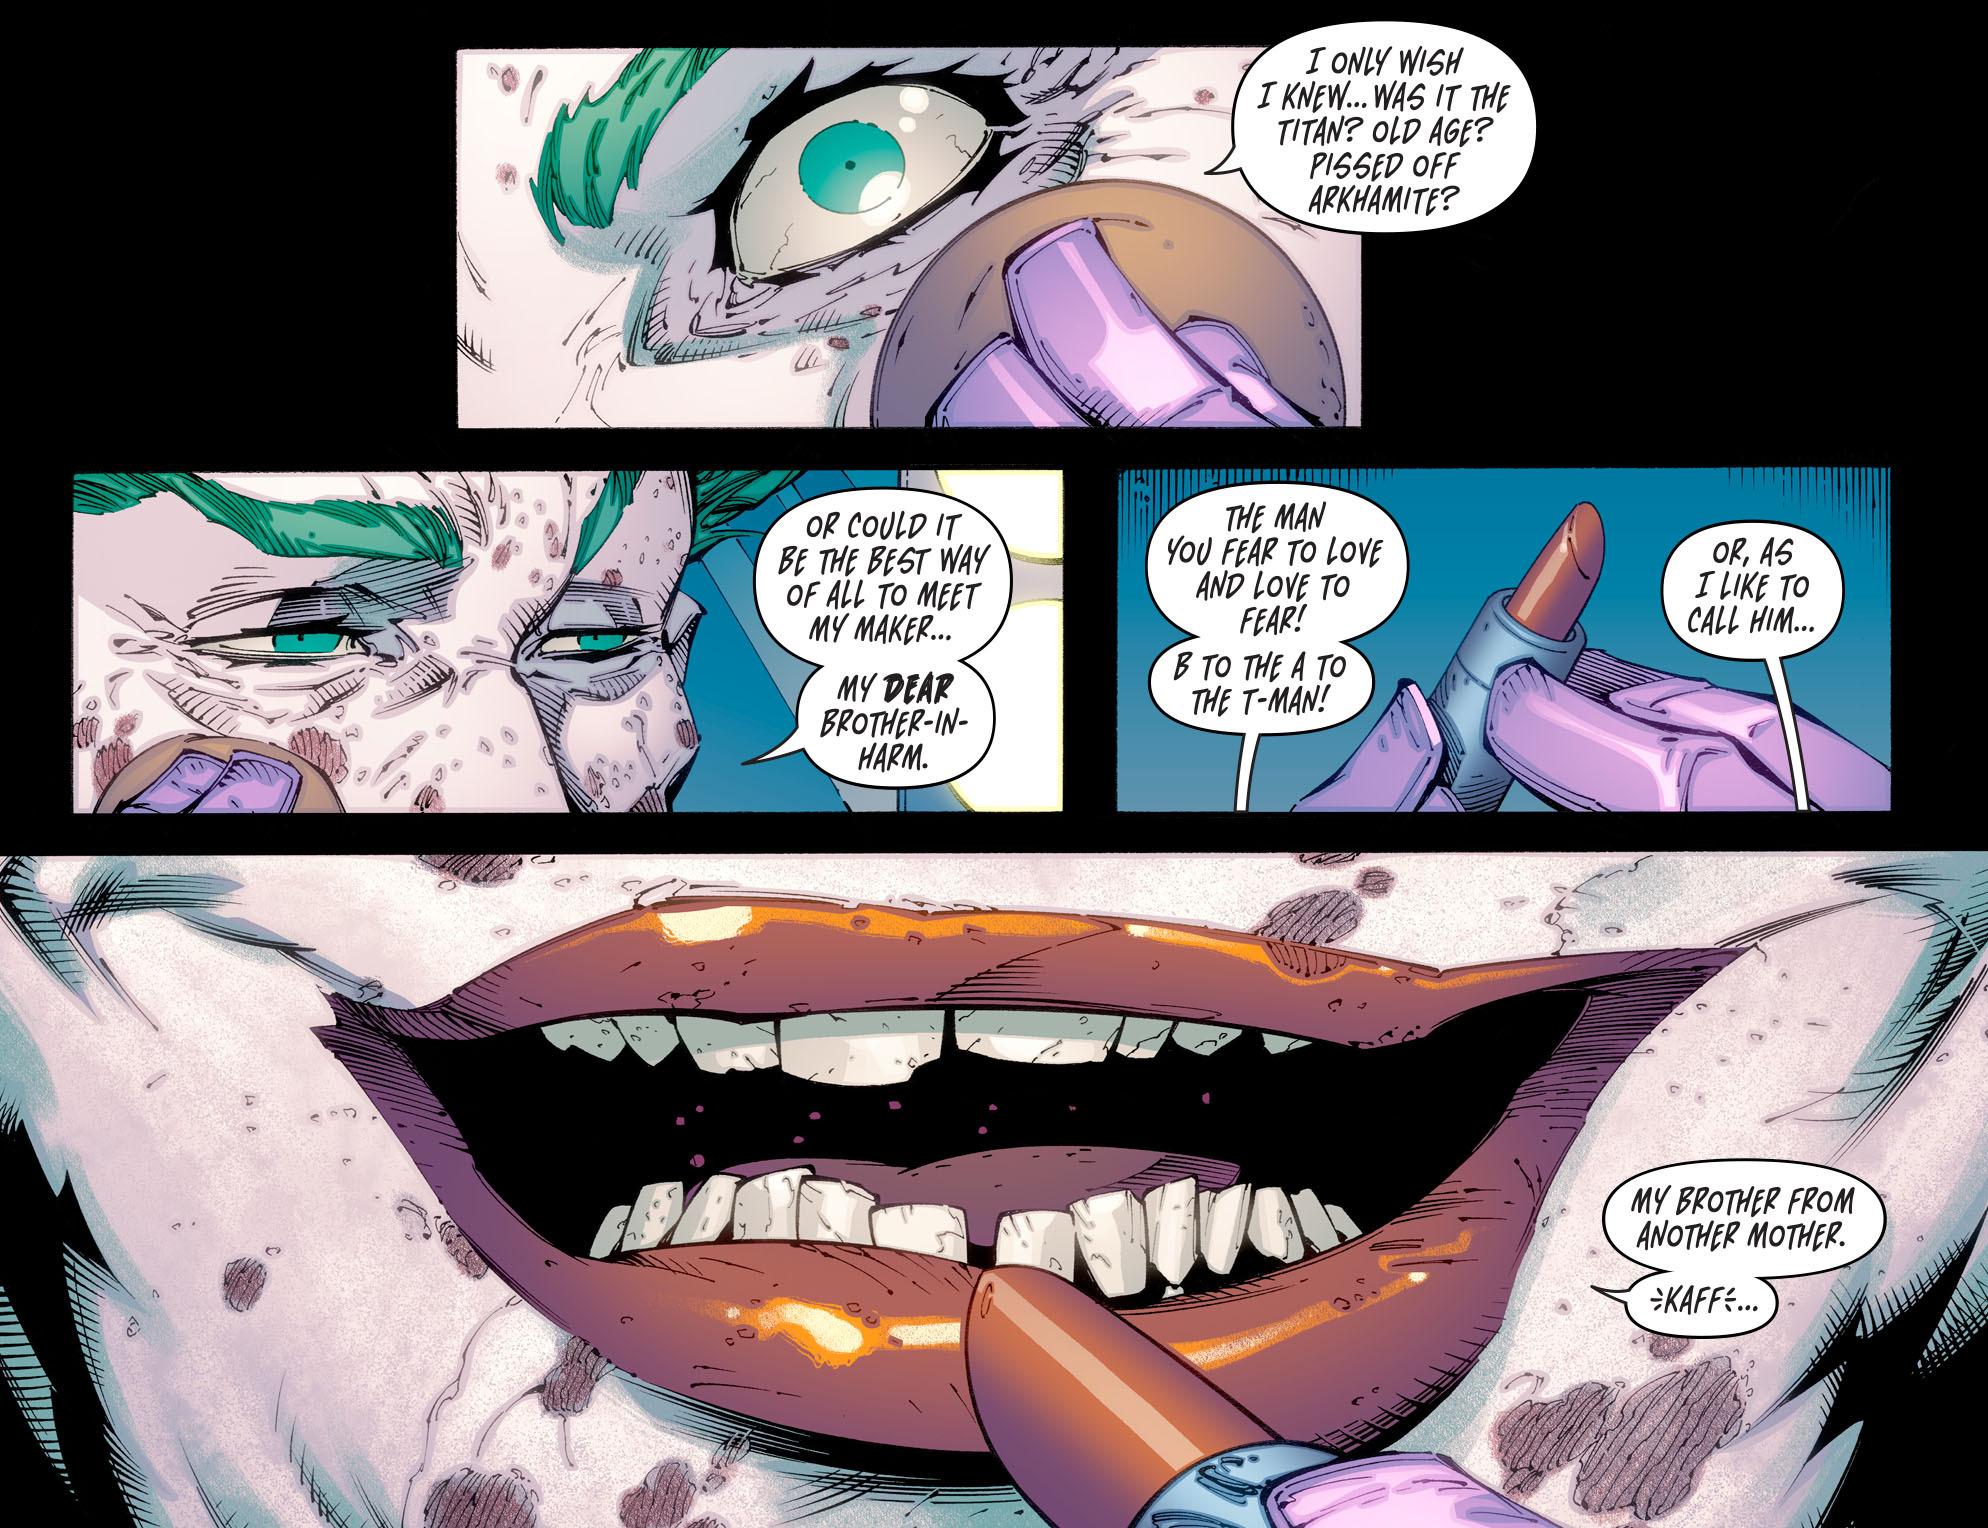 Batman: Arkham Knight [I] Issue #4 #6 - English 4